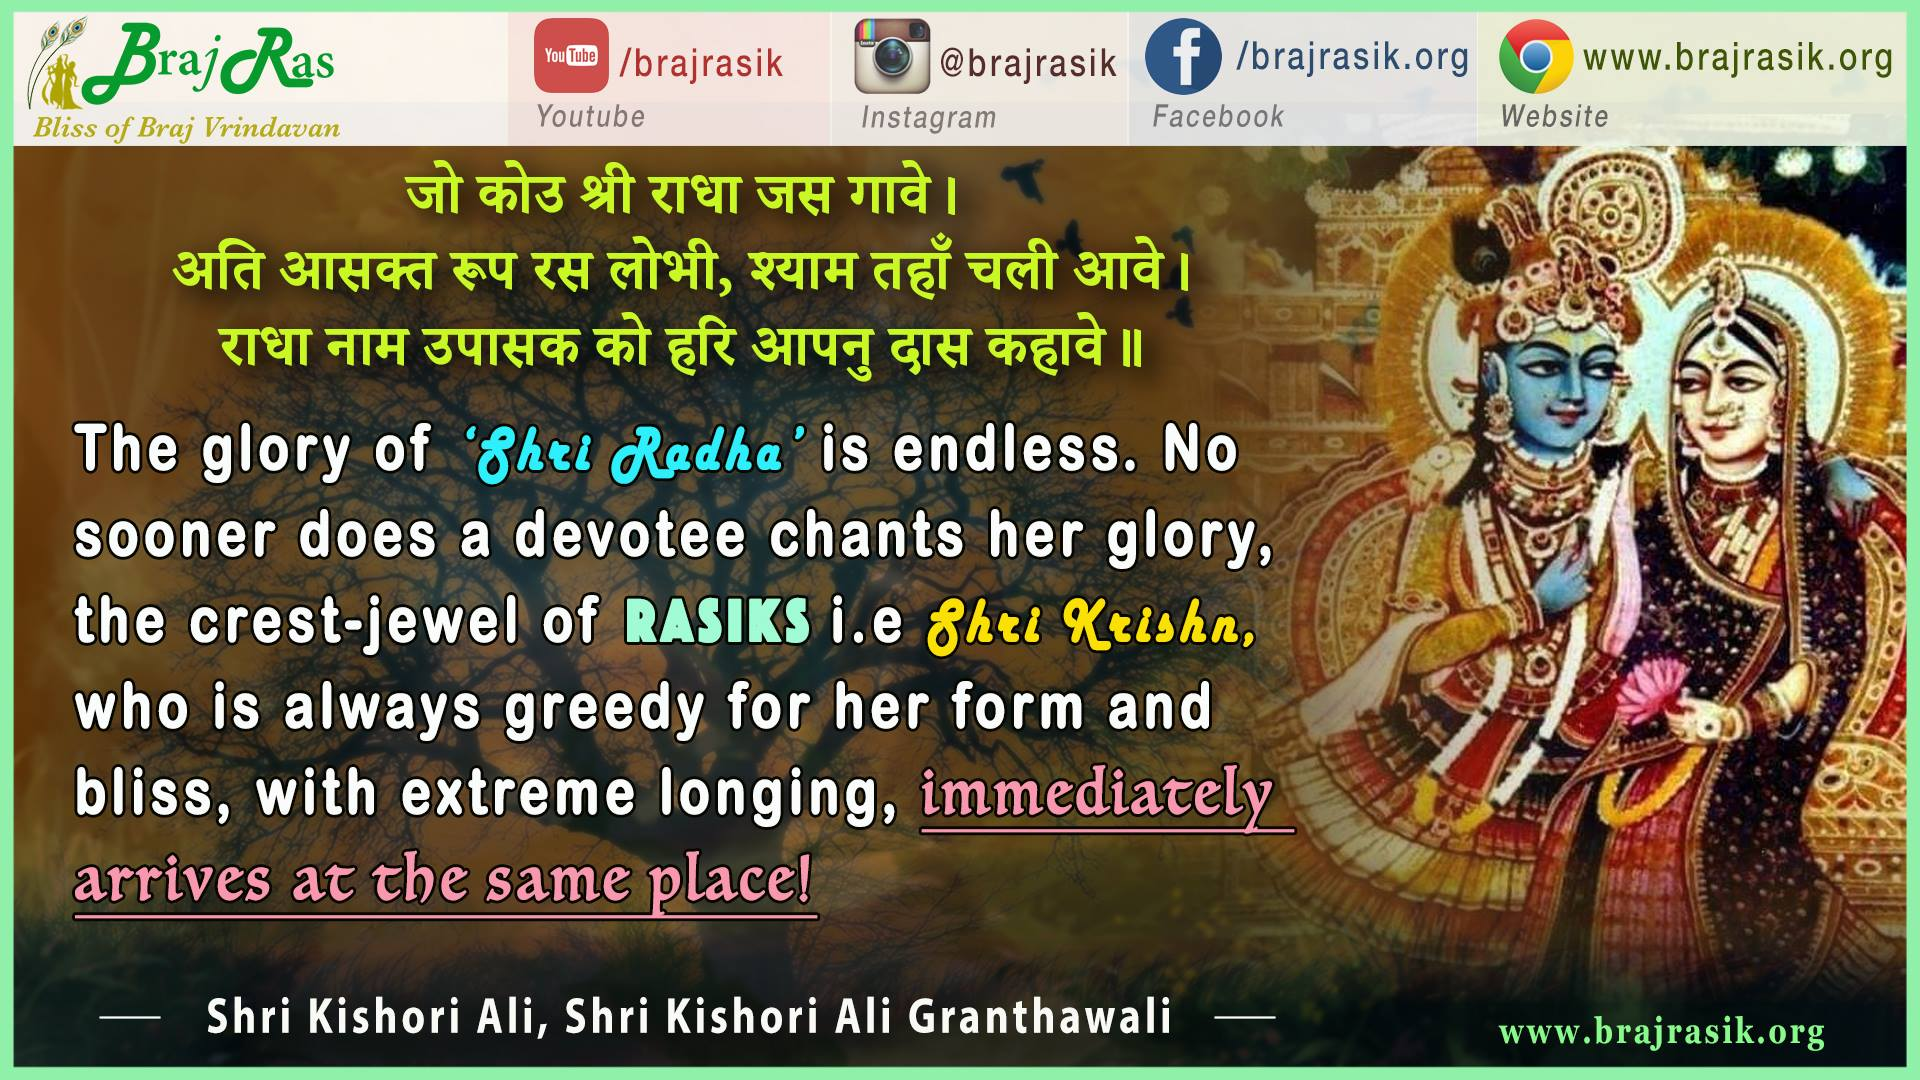 Jo Kou Shri Radha Jas Gave - Shri Kishori Ali, Shri Kishori Ali Granthawali